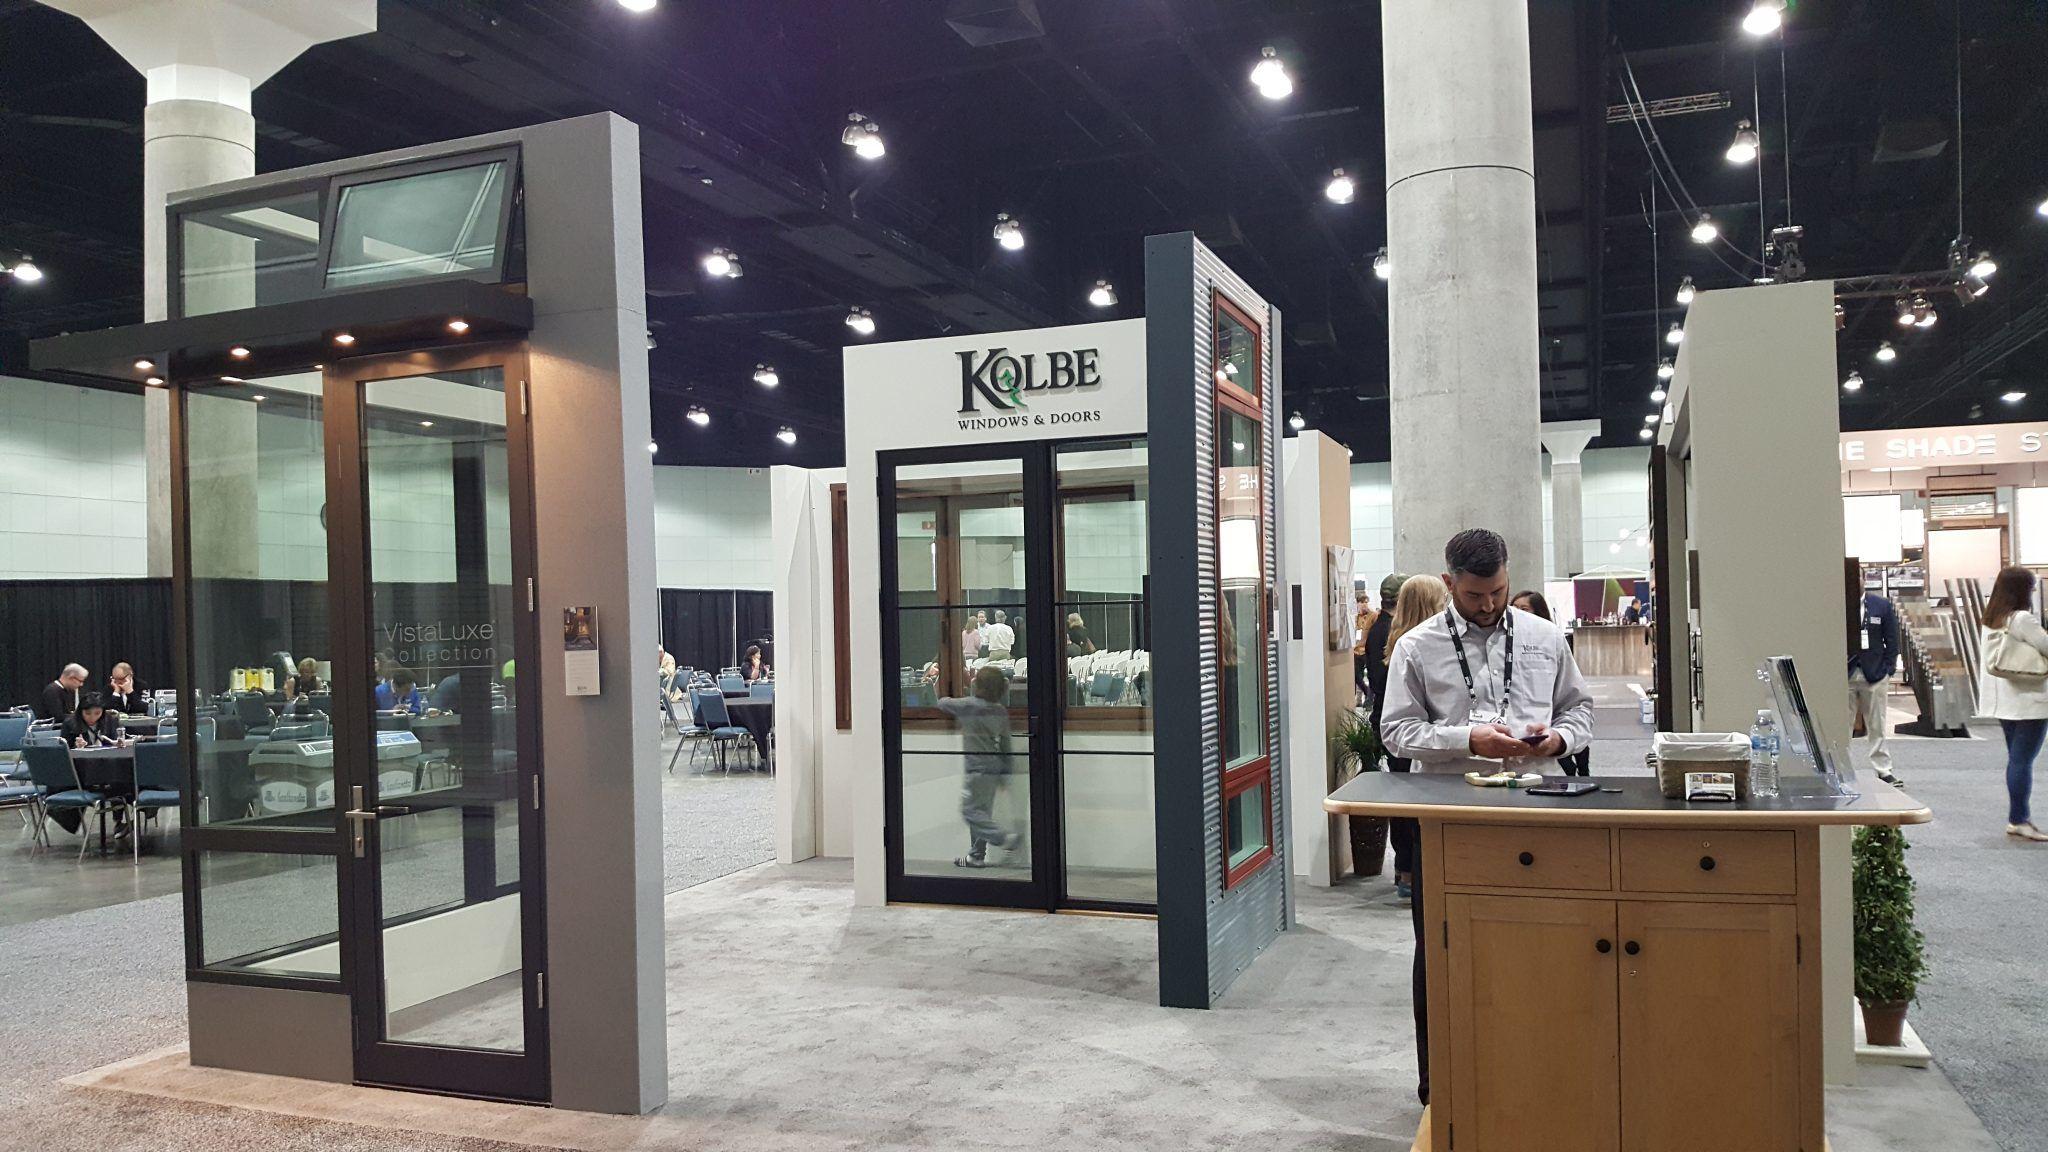 kolbe-black-window-frames-dwell-on-design-2018-los-angeles